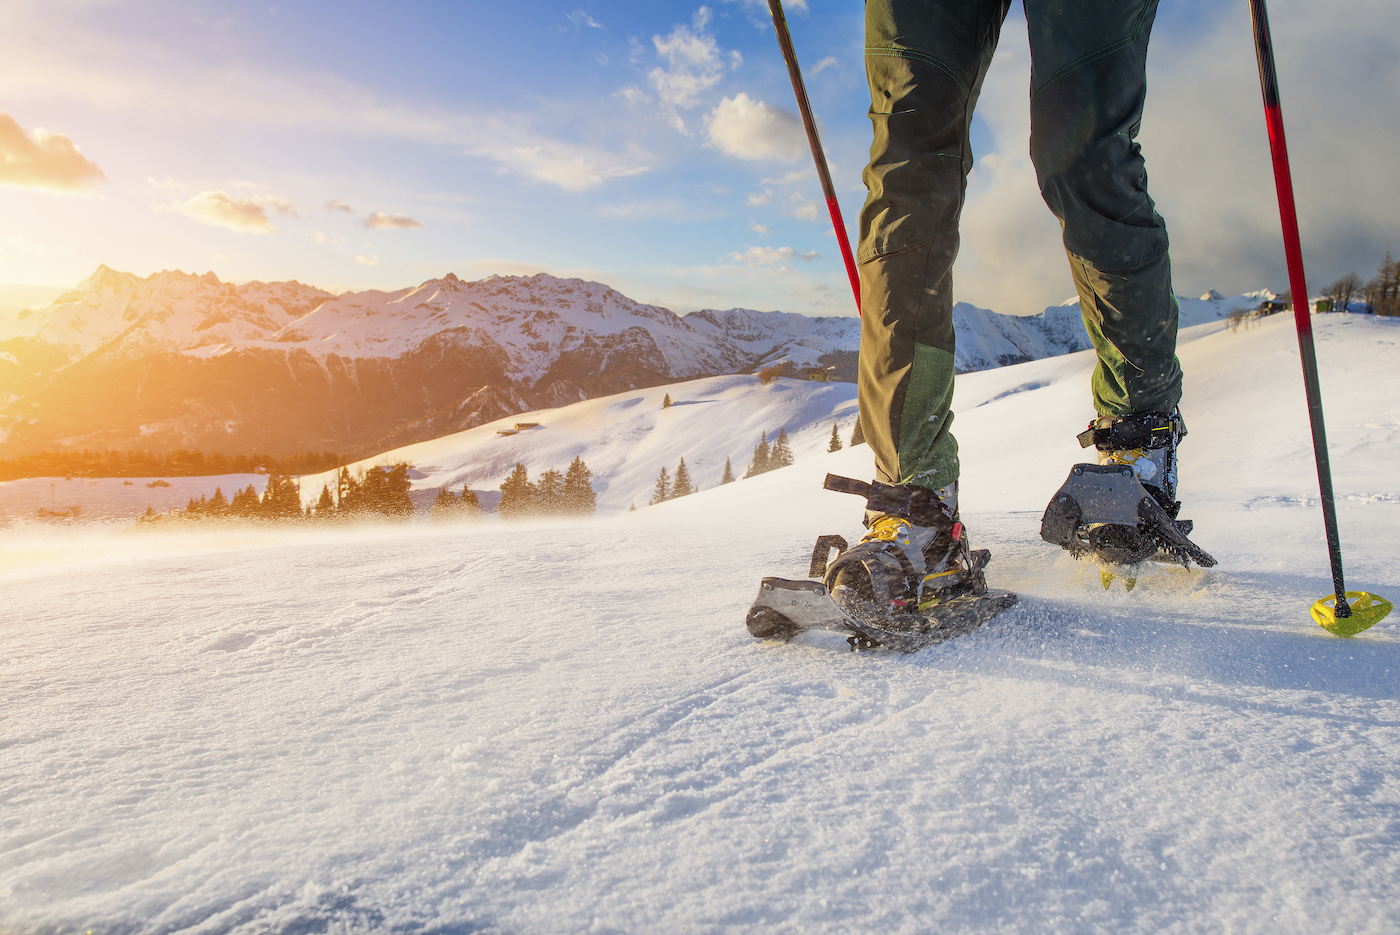 Snowshoeing-Tips-for-Beginners-1.jpg